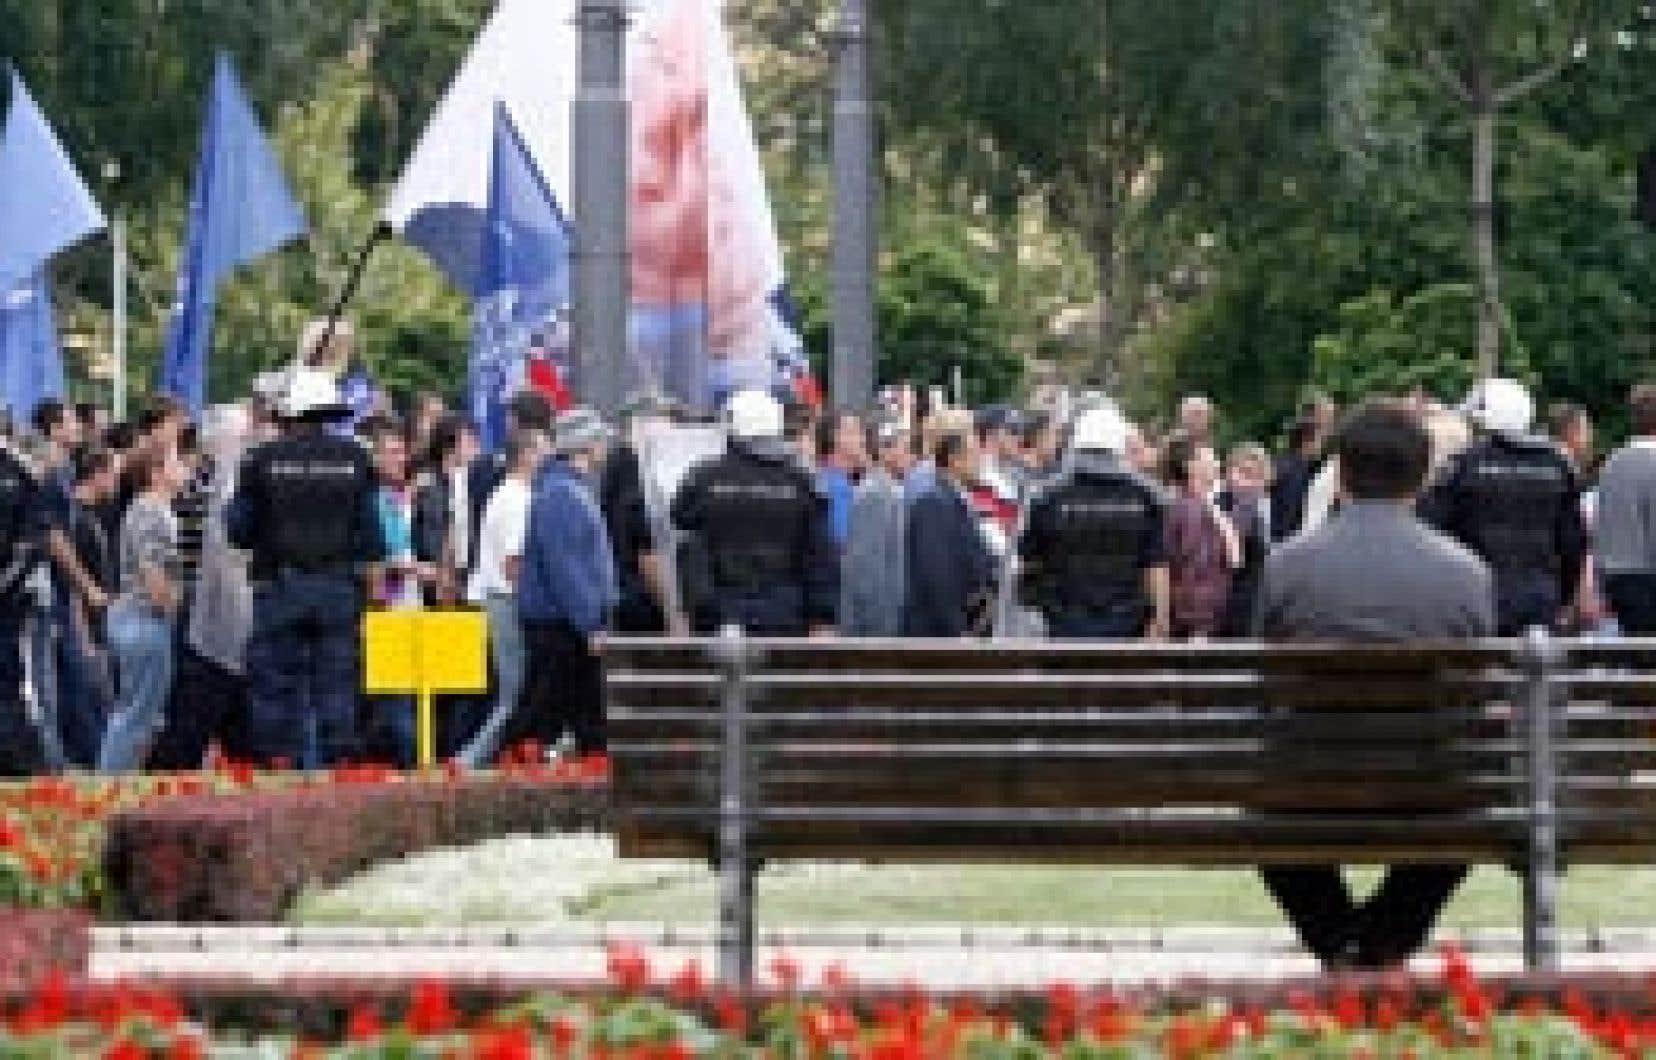 Les partisans de Karadzic ont de nouveau manifesté hier à Belgrade. Photo: Djodje Kojadinovic